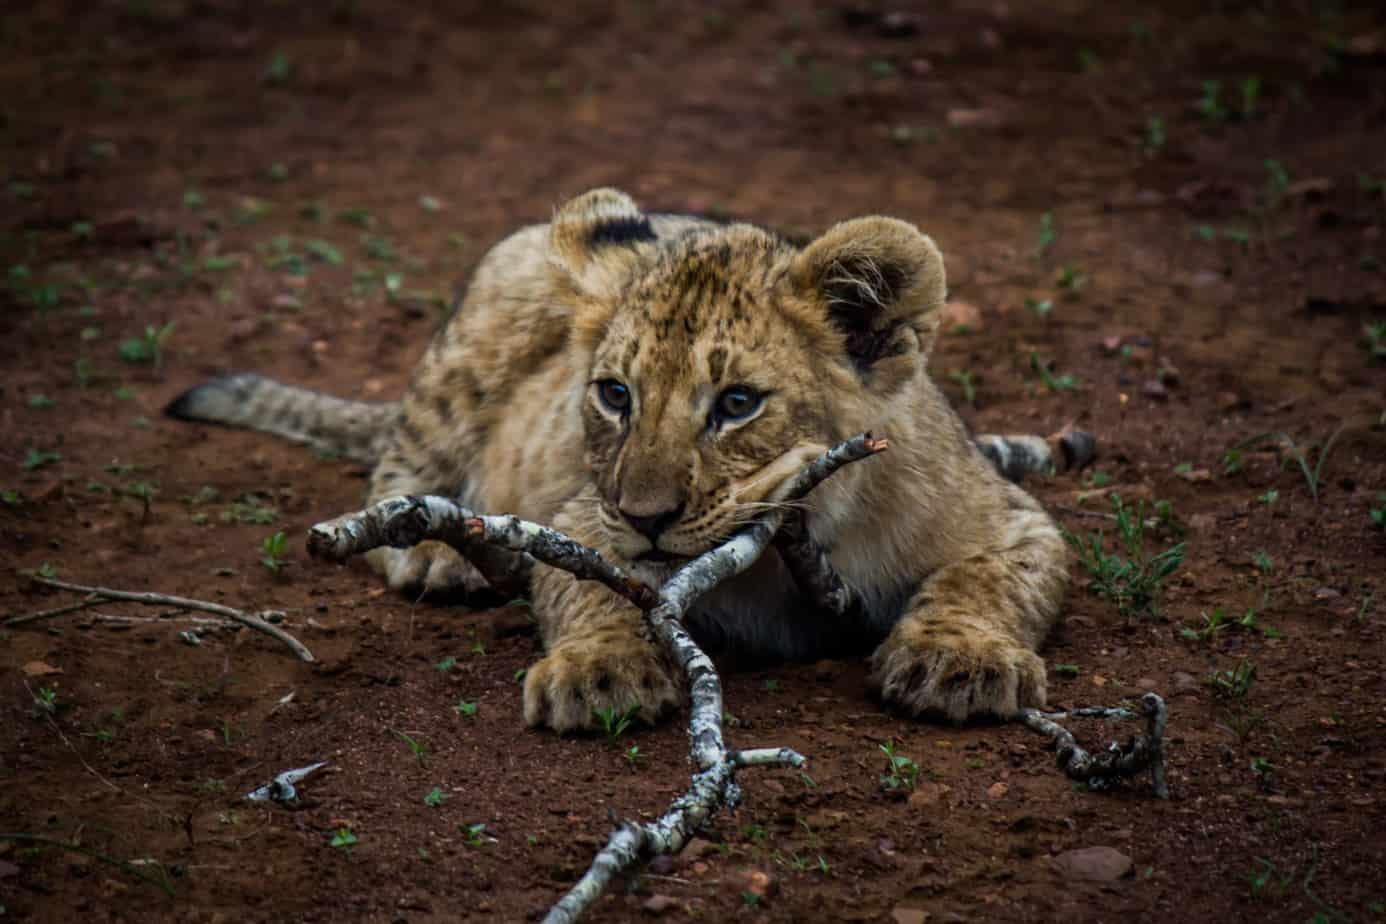 Lion Cub @ Thanda Game Reserve. Photo: Håvard Rosenlund